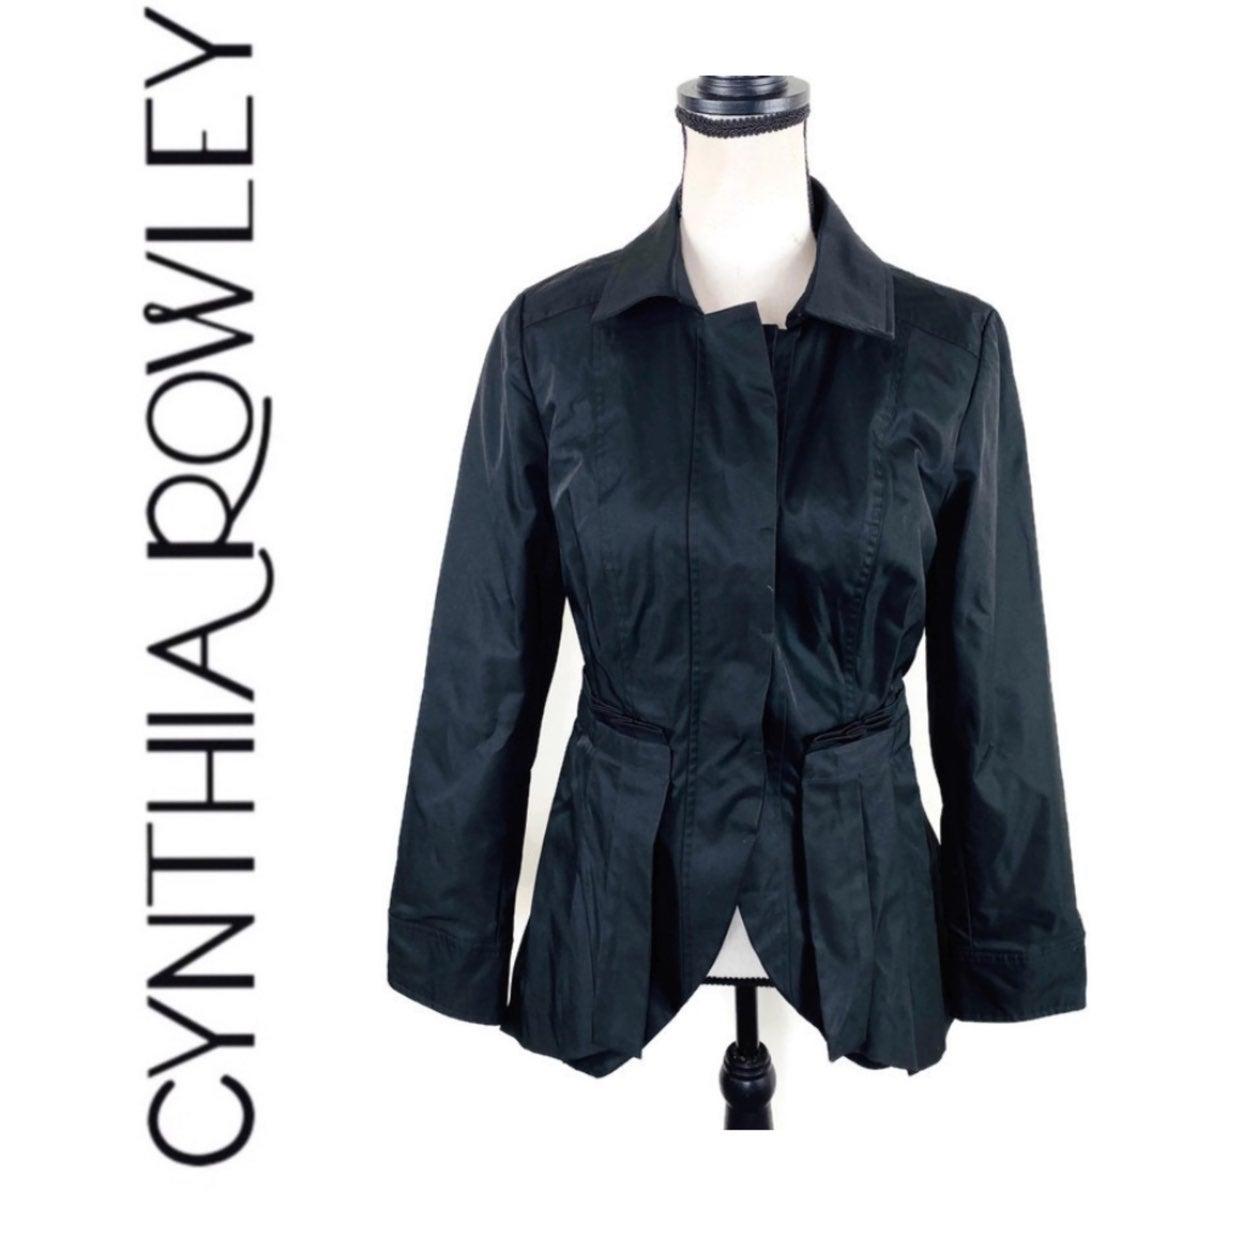 Cynthia Rowley Black Peplum Coat Jacket